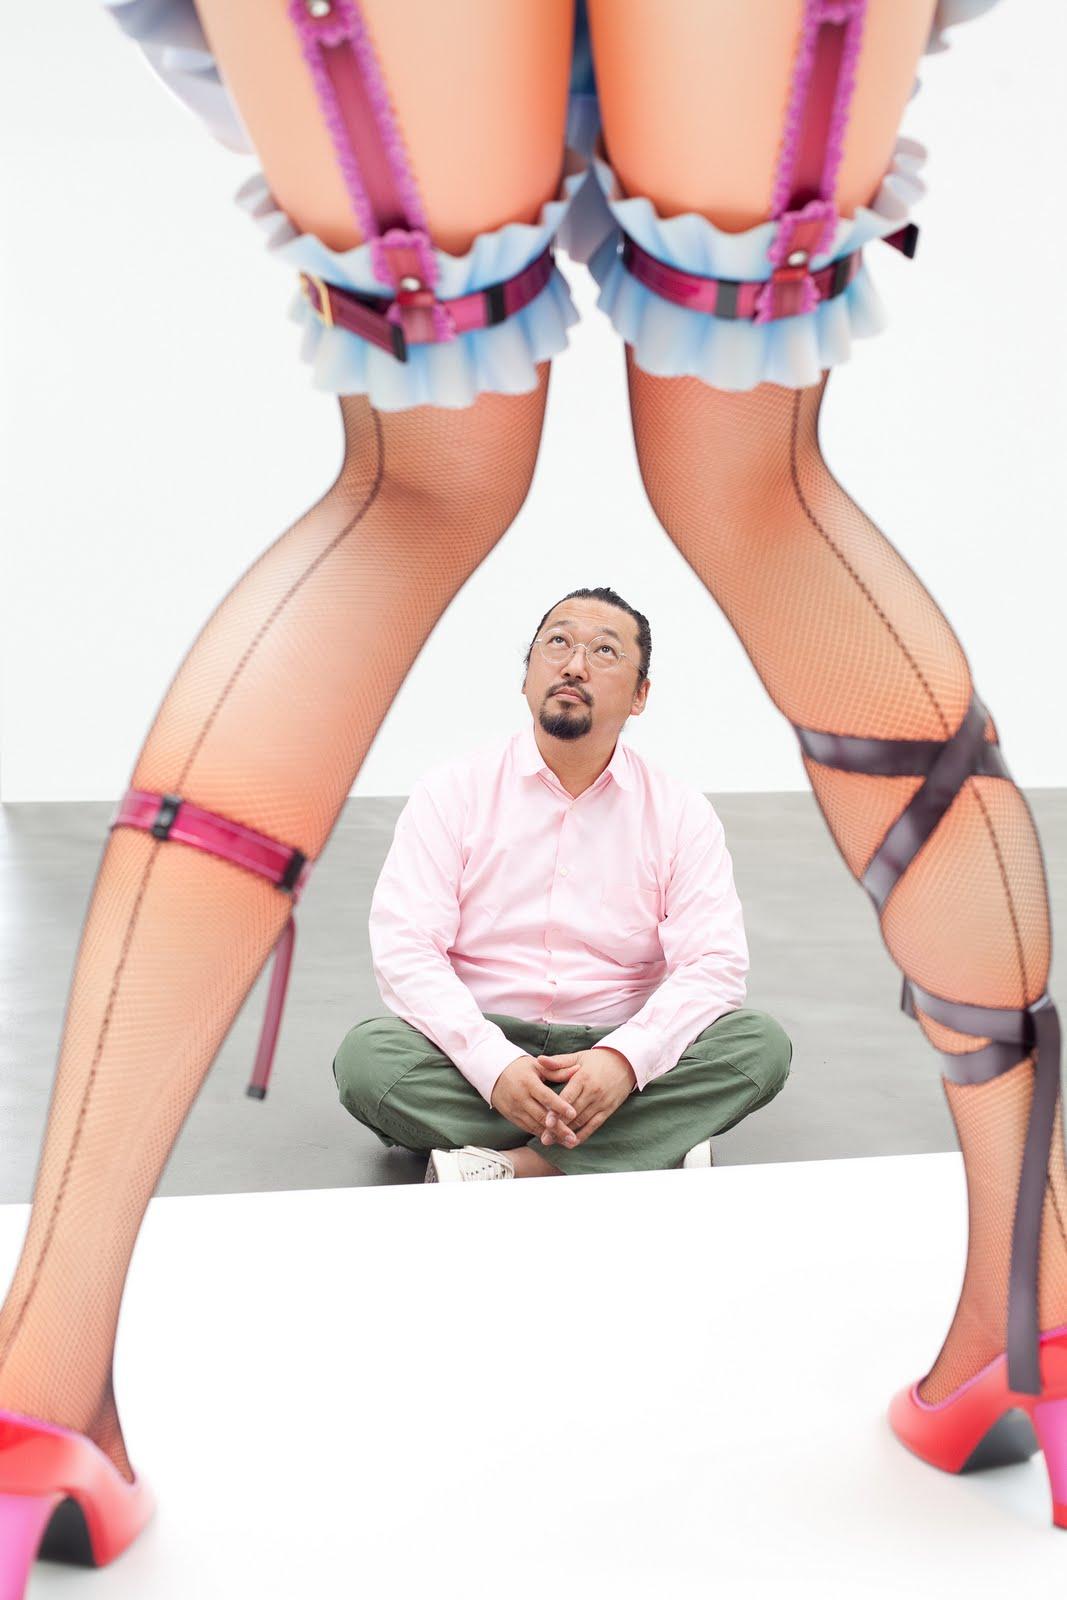 Erotica Gallery Post 50